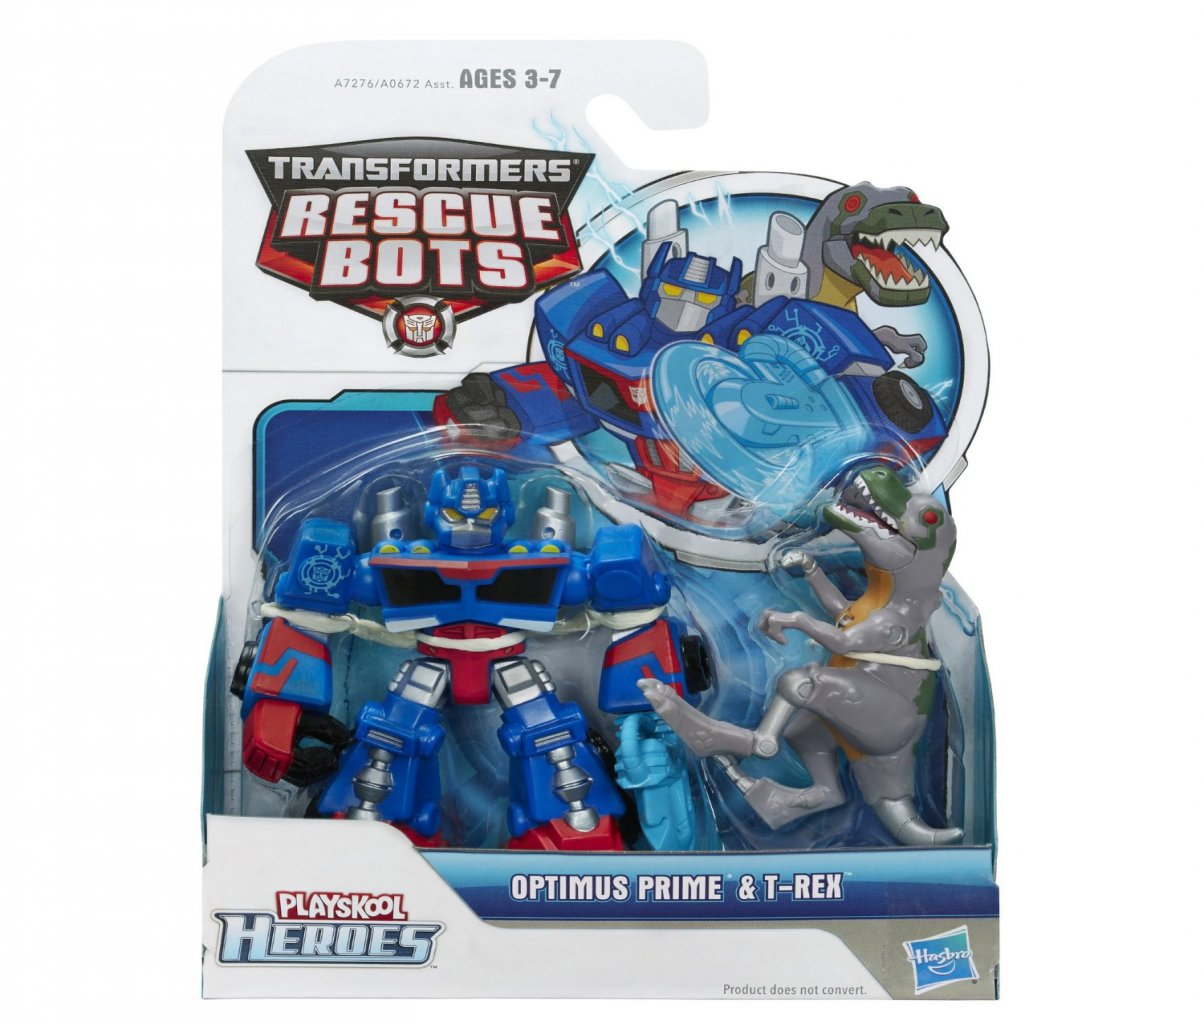 Transformers Rescue Bots Playskool Heroes: Optimus Prime & T-Rex